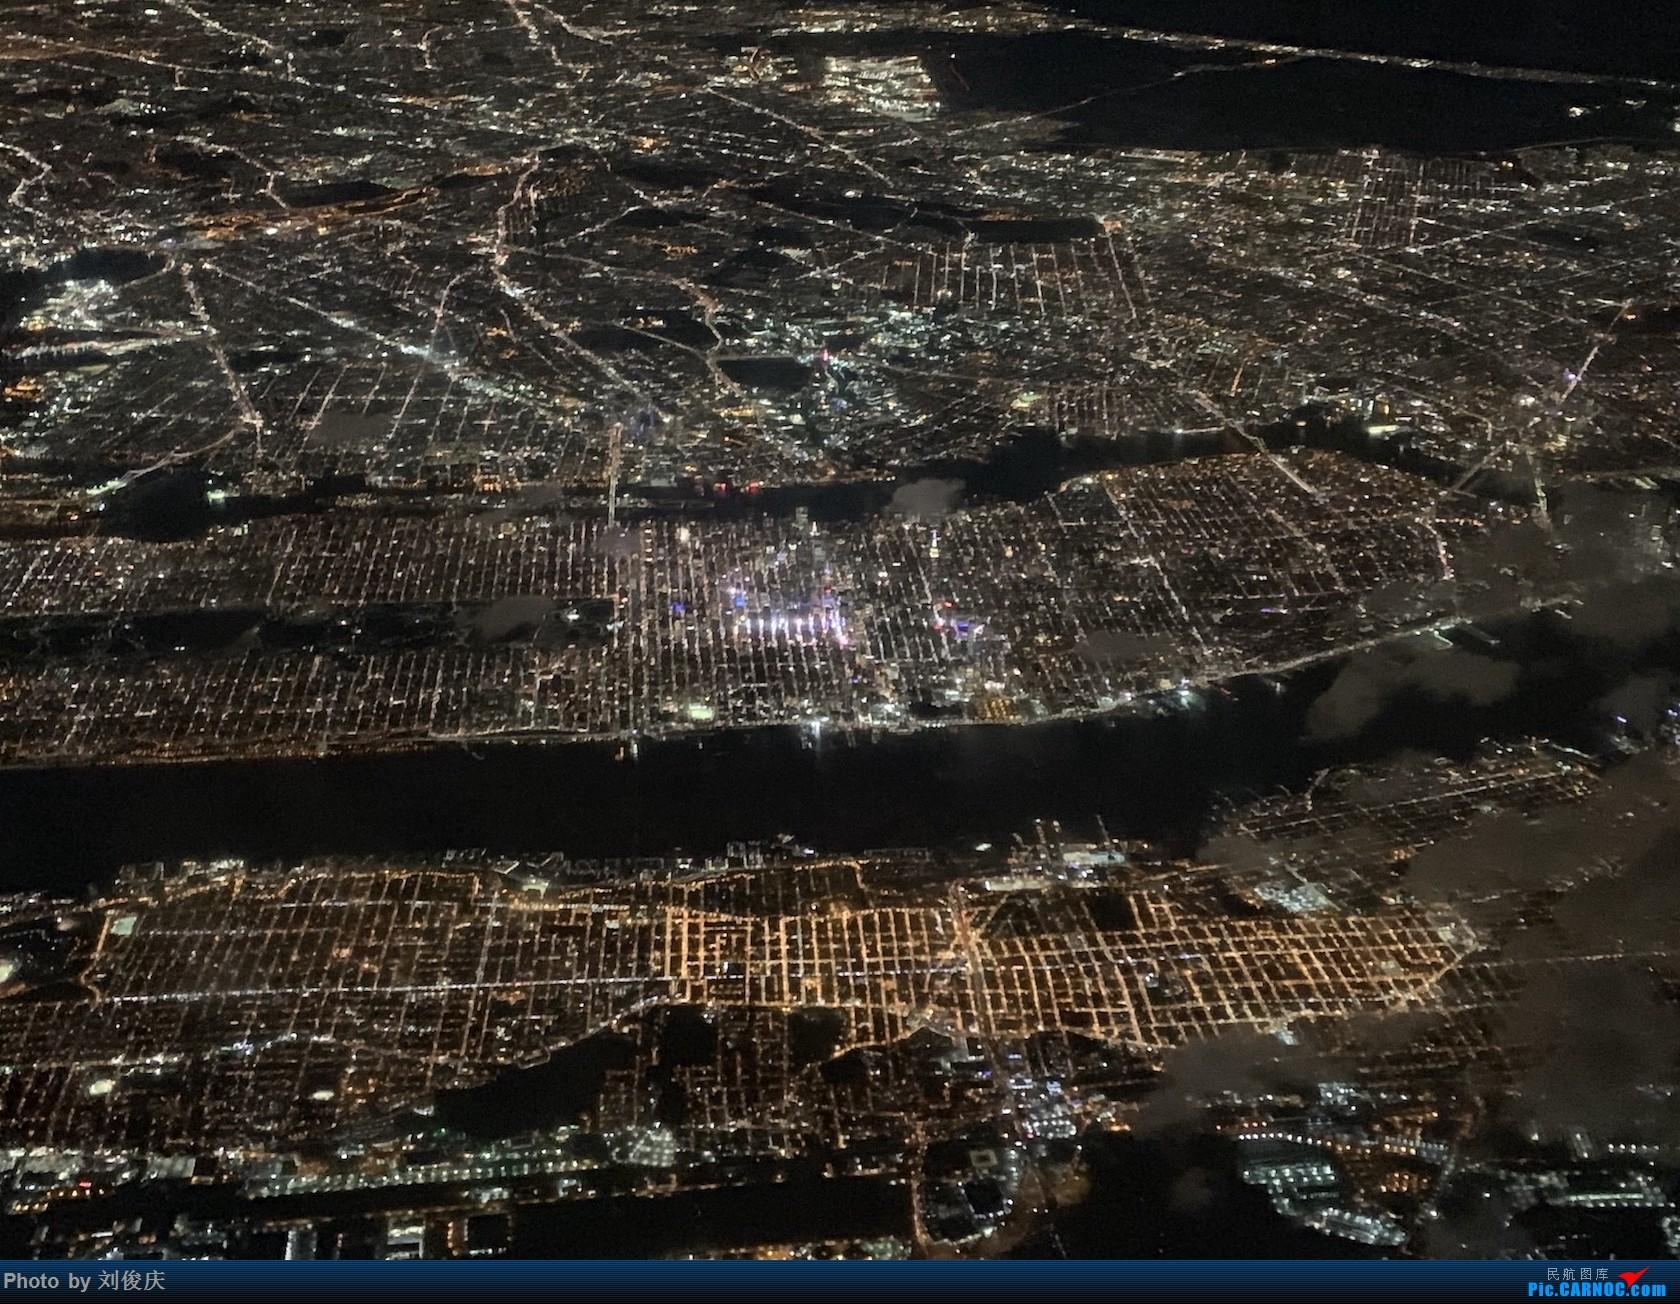 Re:[原创]SEA-LHR-CDG-FCO 8天3国5城暴走游记 BOEING 757-200S N707TW Manhattan